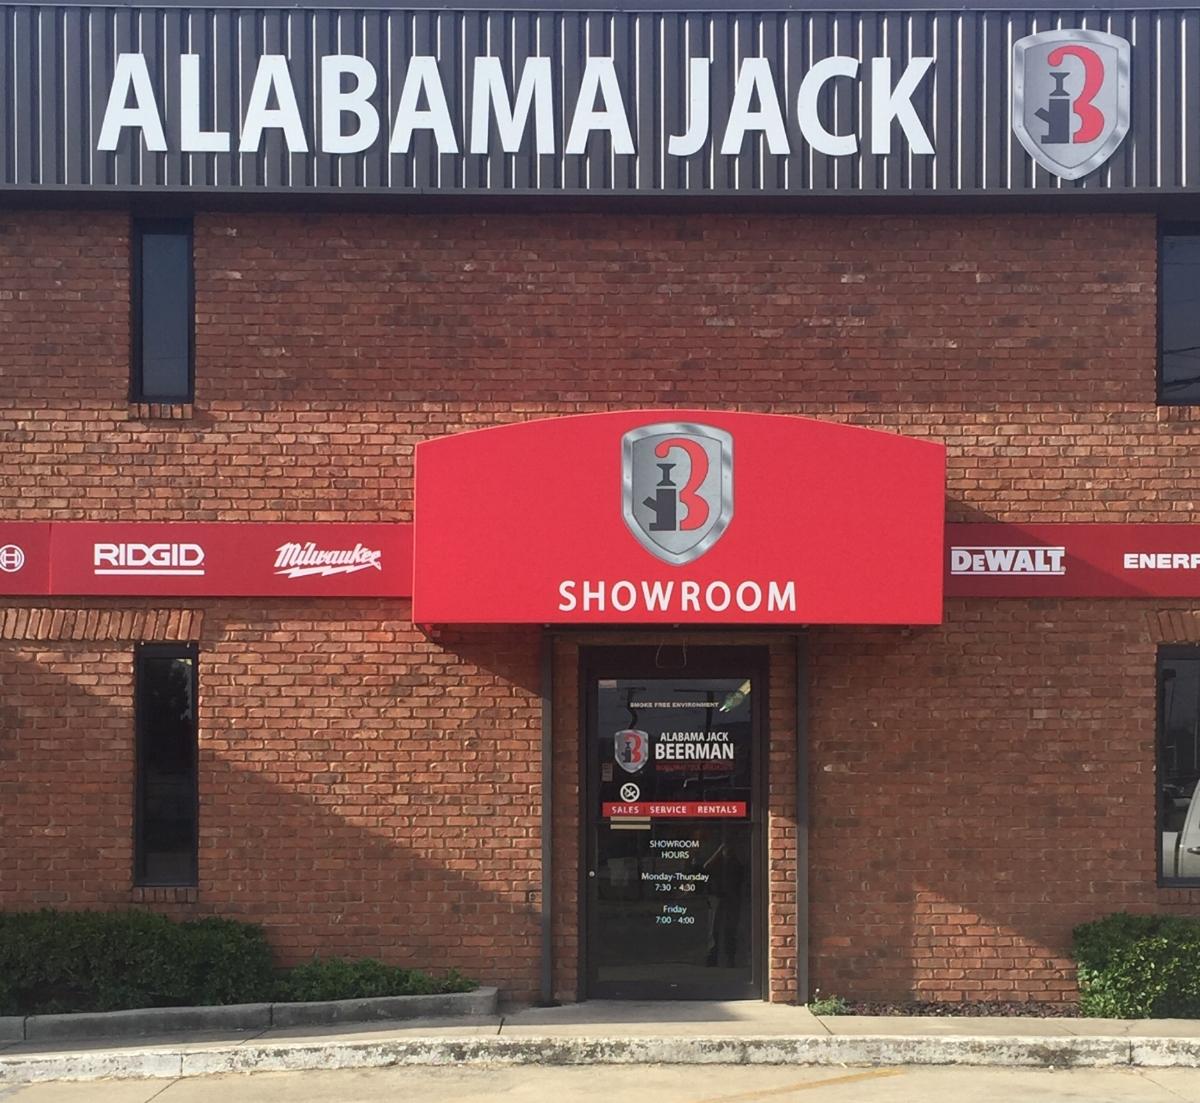 Alabama Jack Store